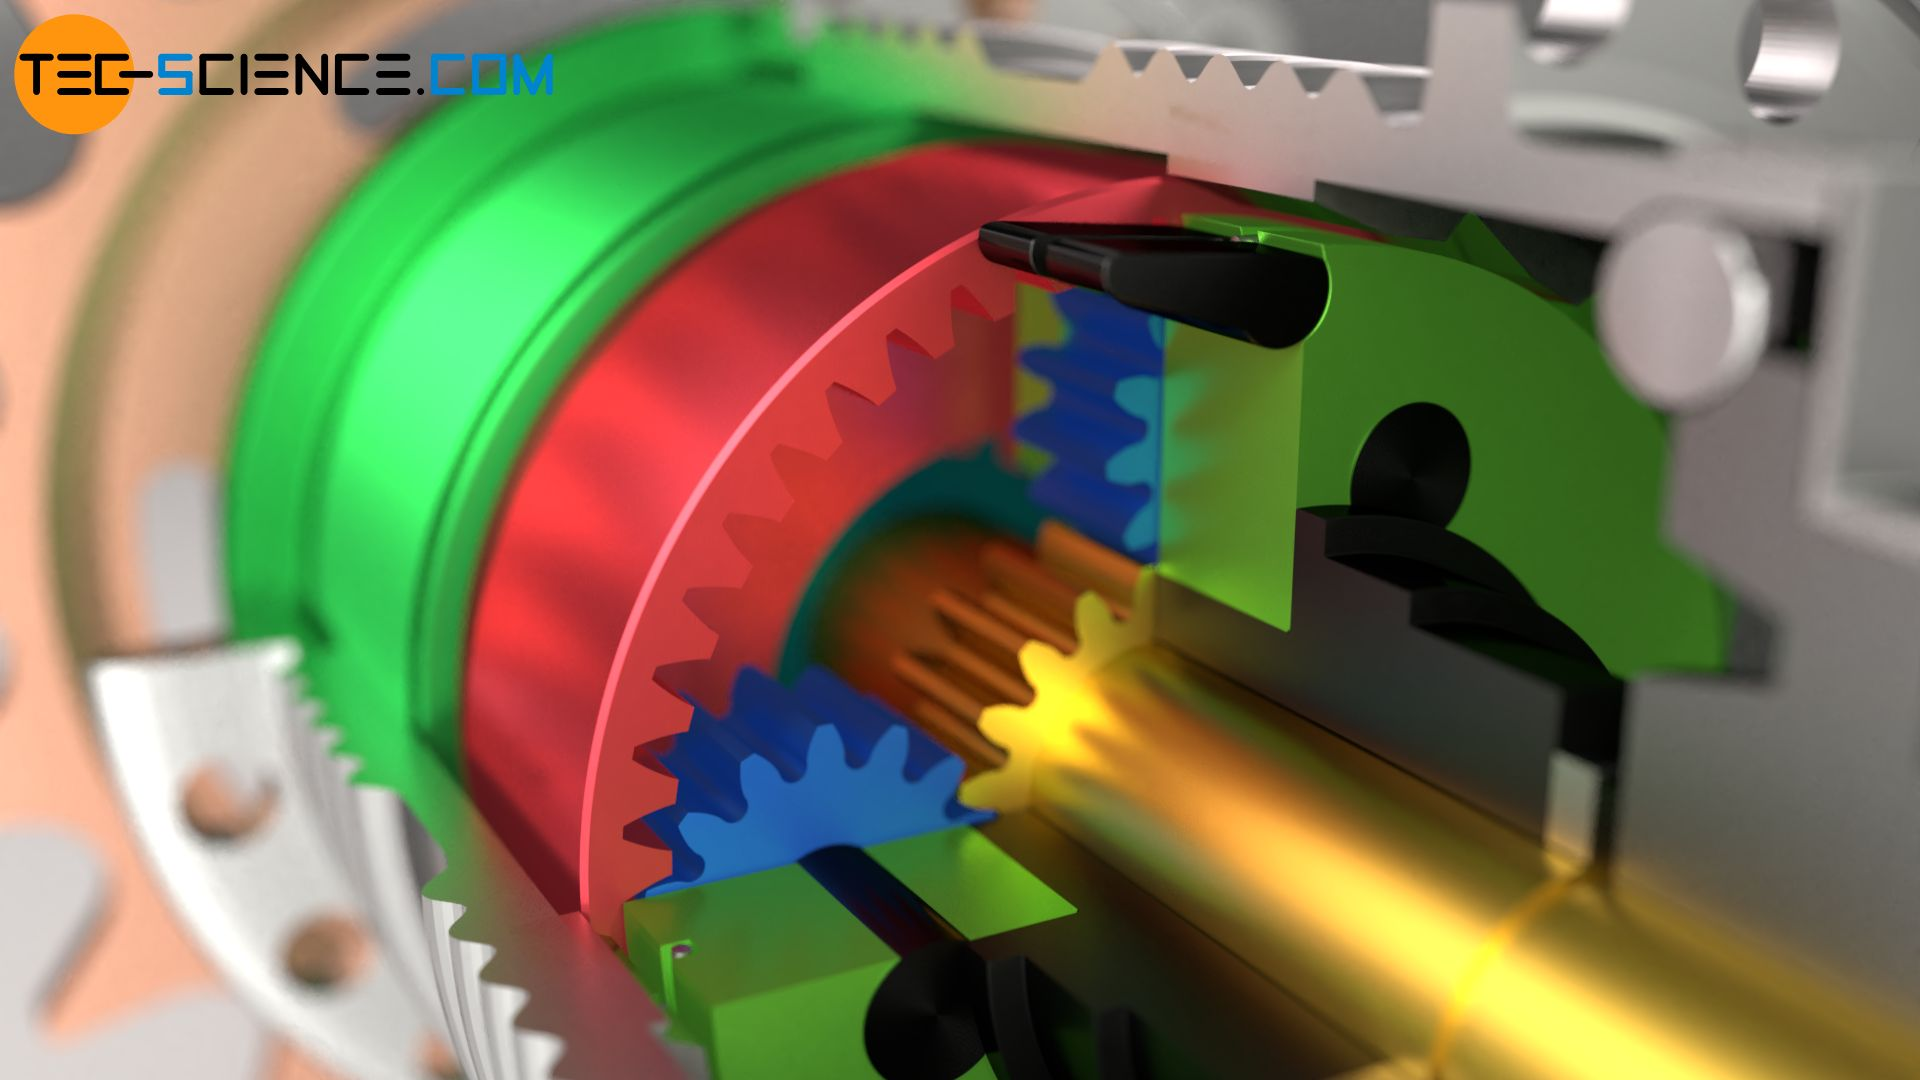 Ring gear of the planetary gear unit of a three-speed internal-gear hub